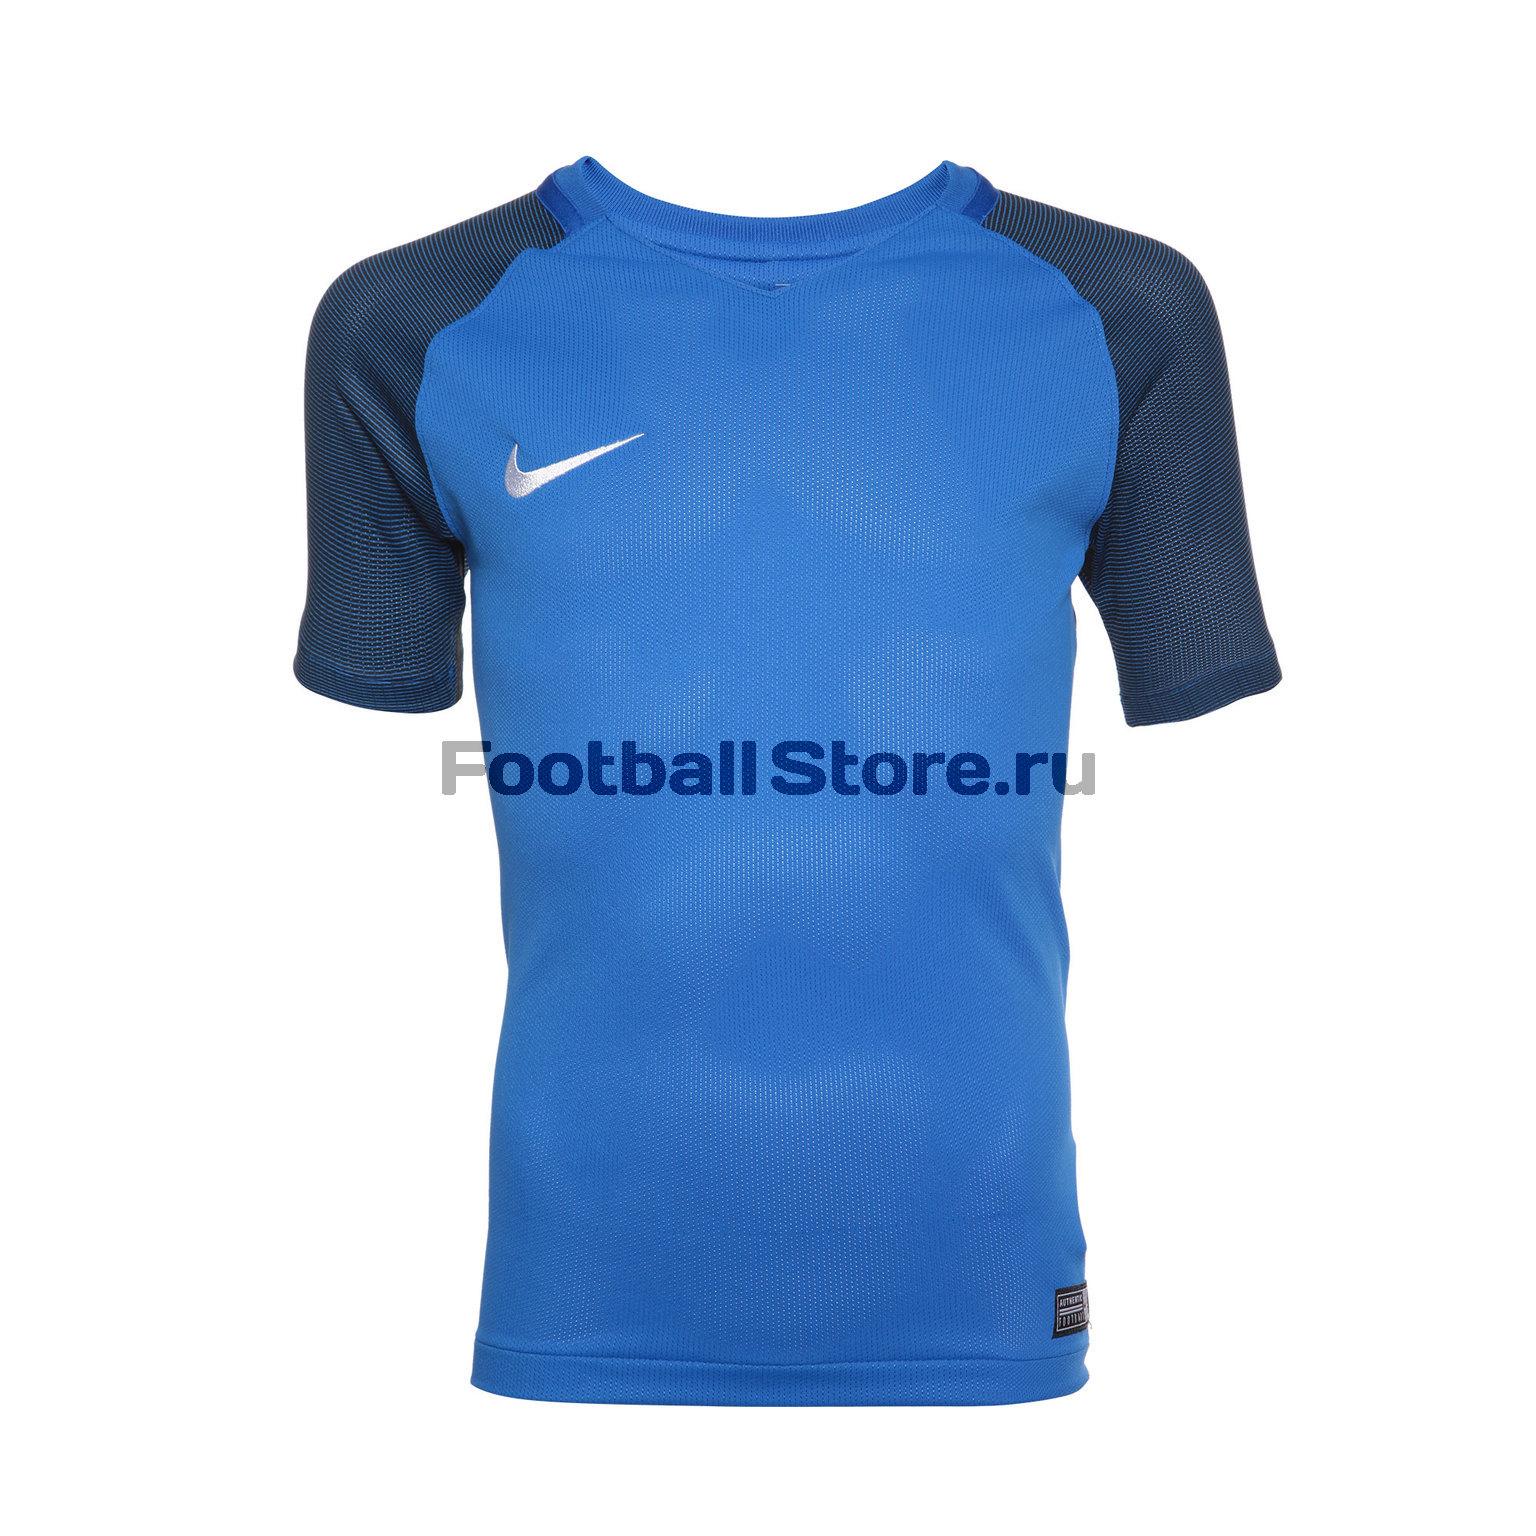 Футболка игровая детская Nike SS YTH Revolution IV JSY 833018-455 футболки nike футболка игровая nike ss revolution iv jsy 833017 010